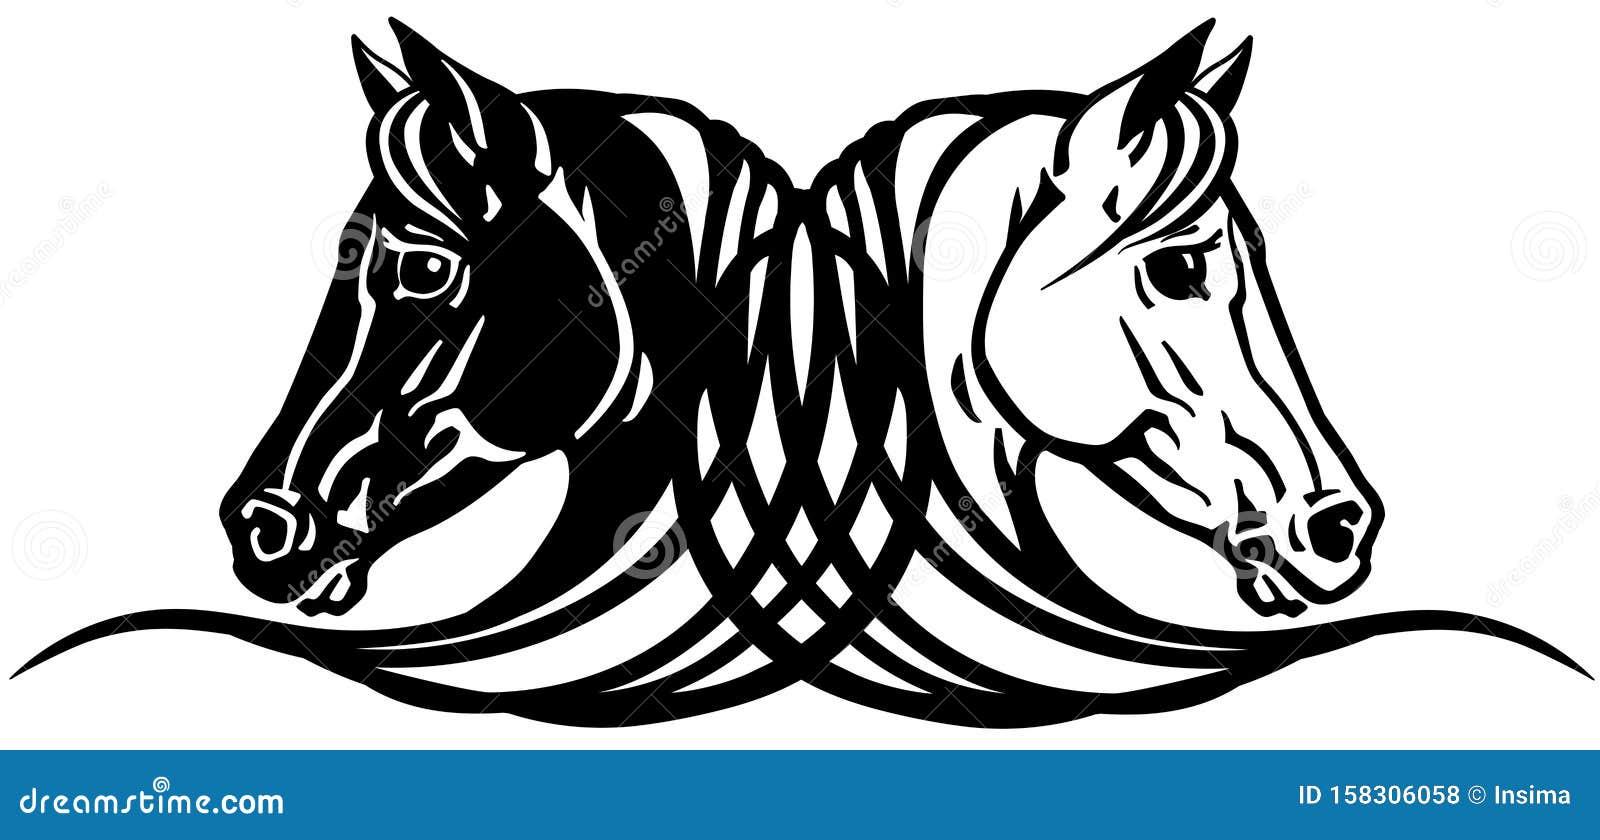 Two Horses Heads Tattoo Stock Vector Illustration Of Breeding 158306058